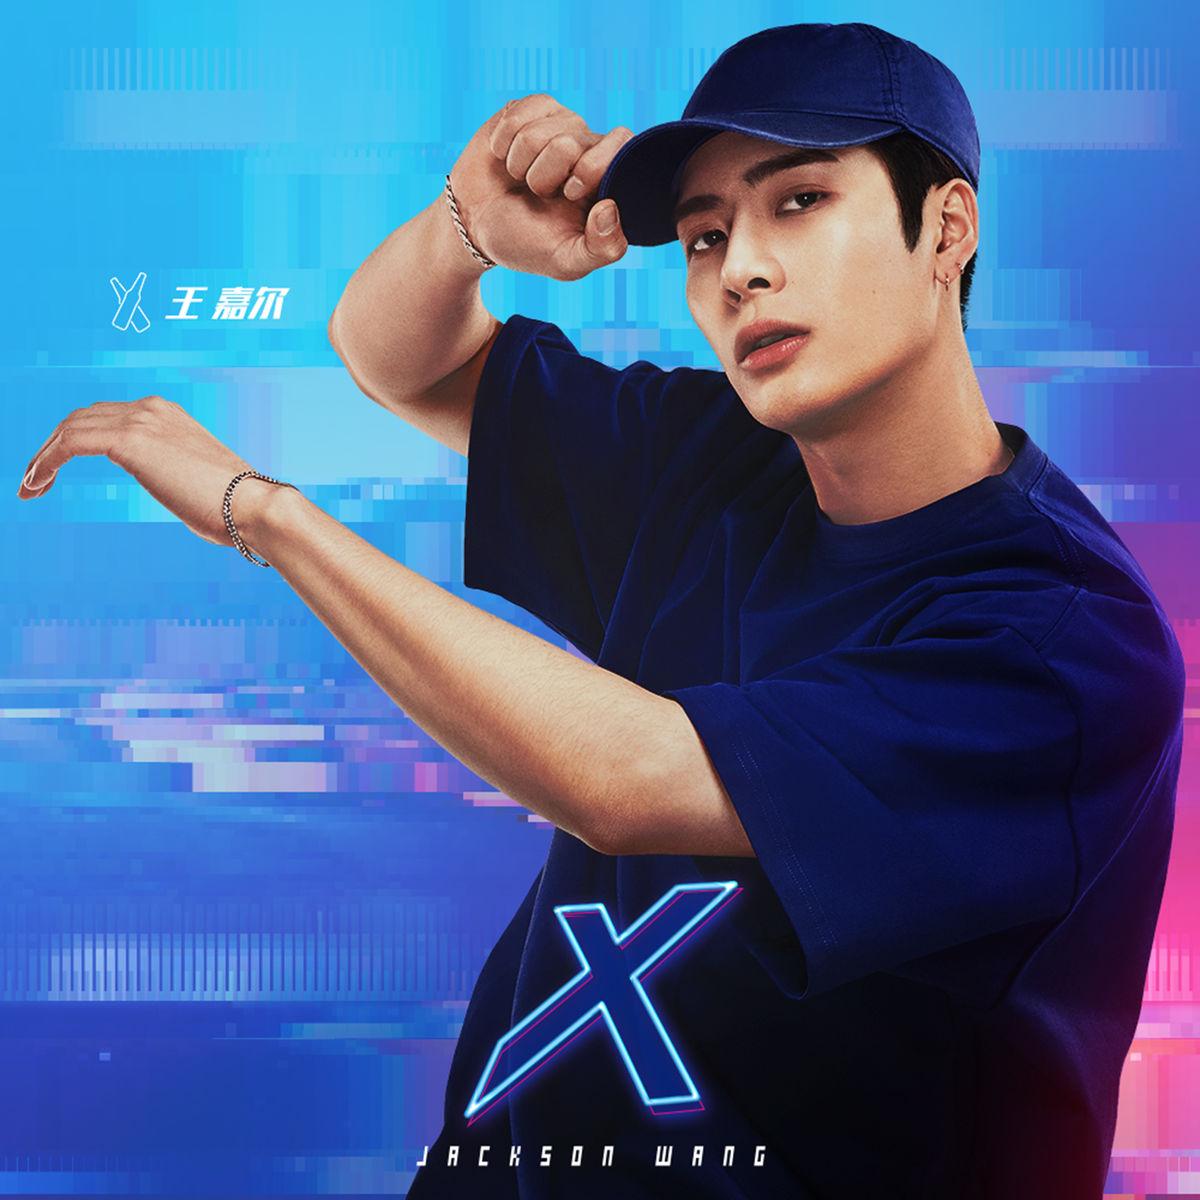 X (Jackson)